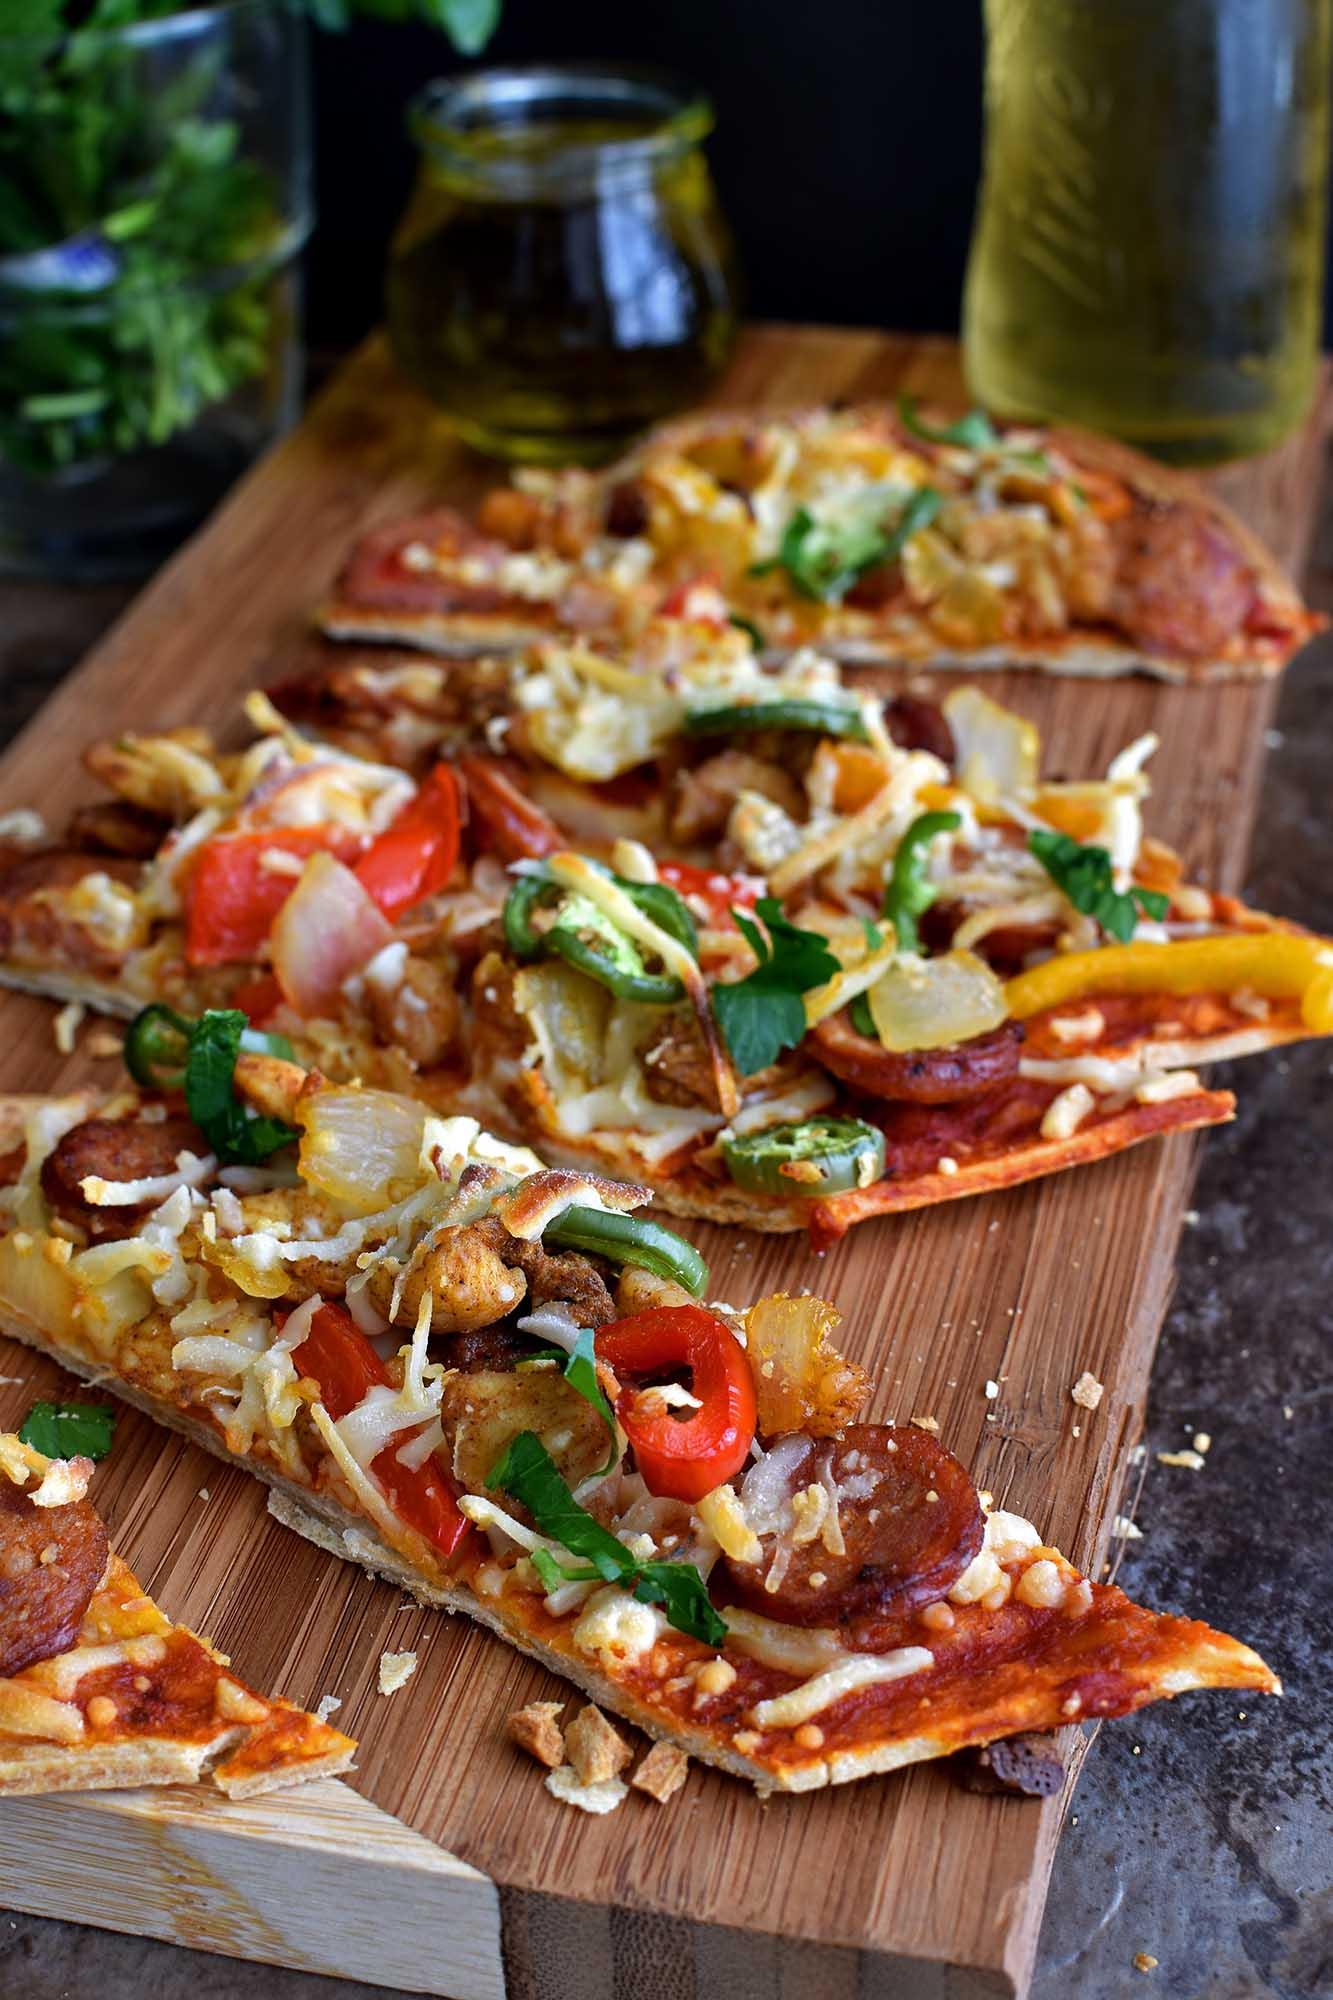 Jambalaya Flatbread - Pepper Delight #pepperdelightblog #recipe #mardigras #appetizer #fattuesday #snack #festival #pizza #flatbread #jambalaya #superbowl #gameday #andouille #cajun